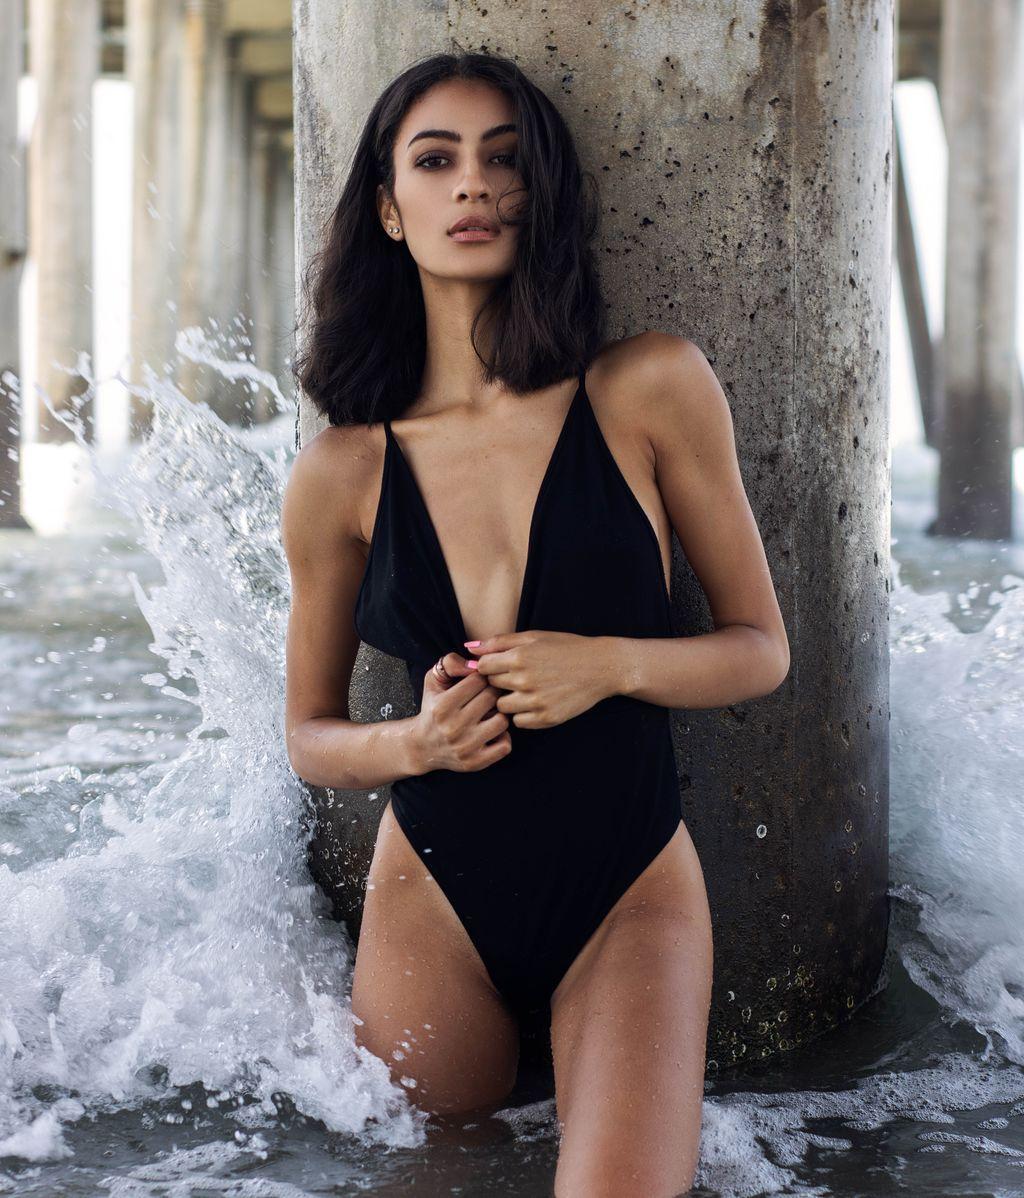 beach-beautiful-woman-brunette-2434781